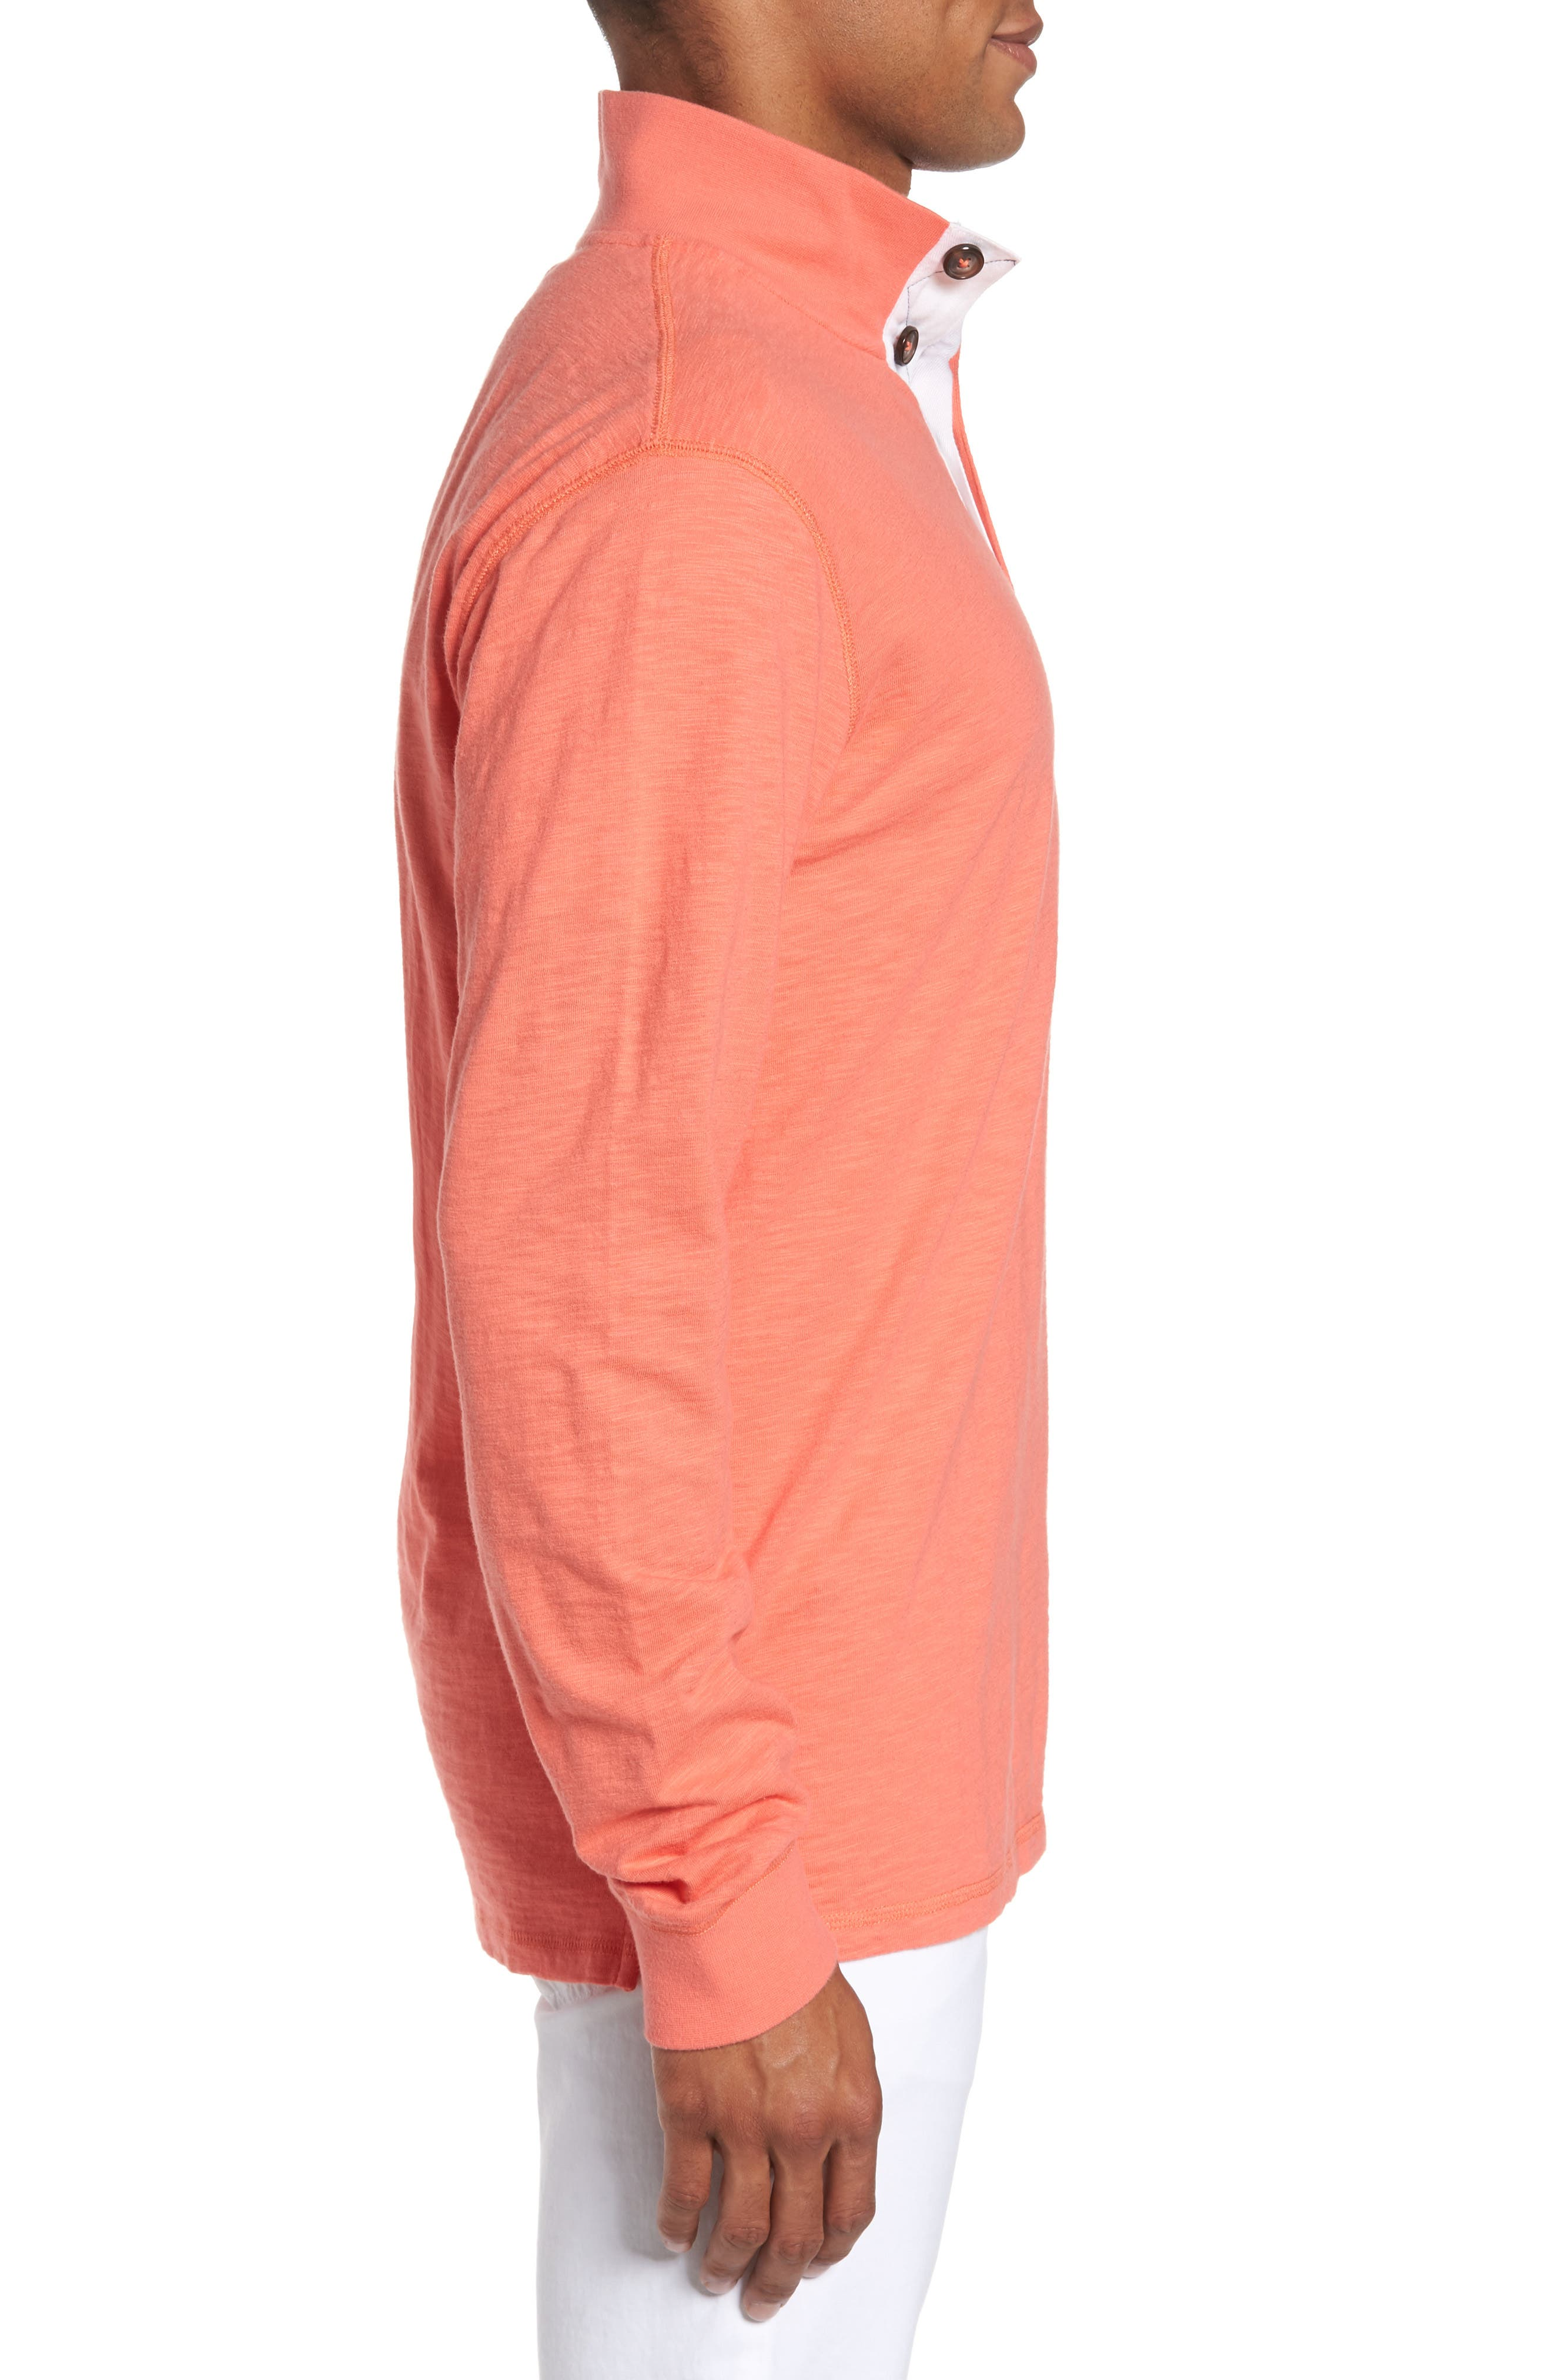 Gulf Stream Sweatshirt,                             Alternate thumbnail 3, color,                             Melon